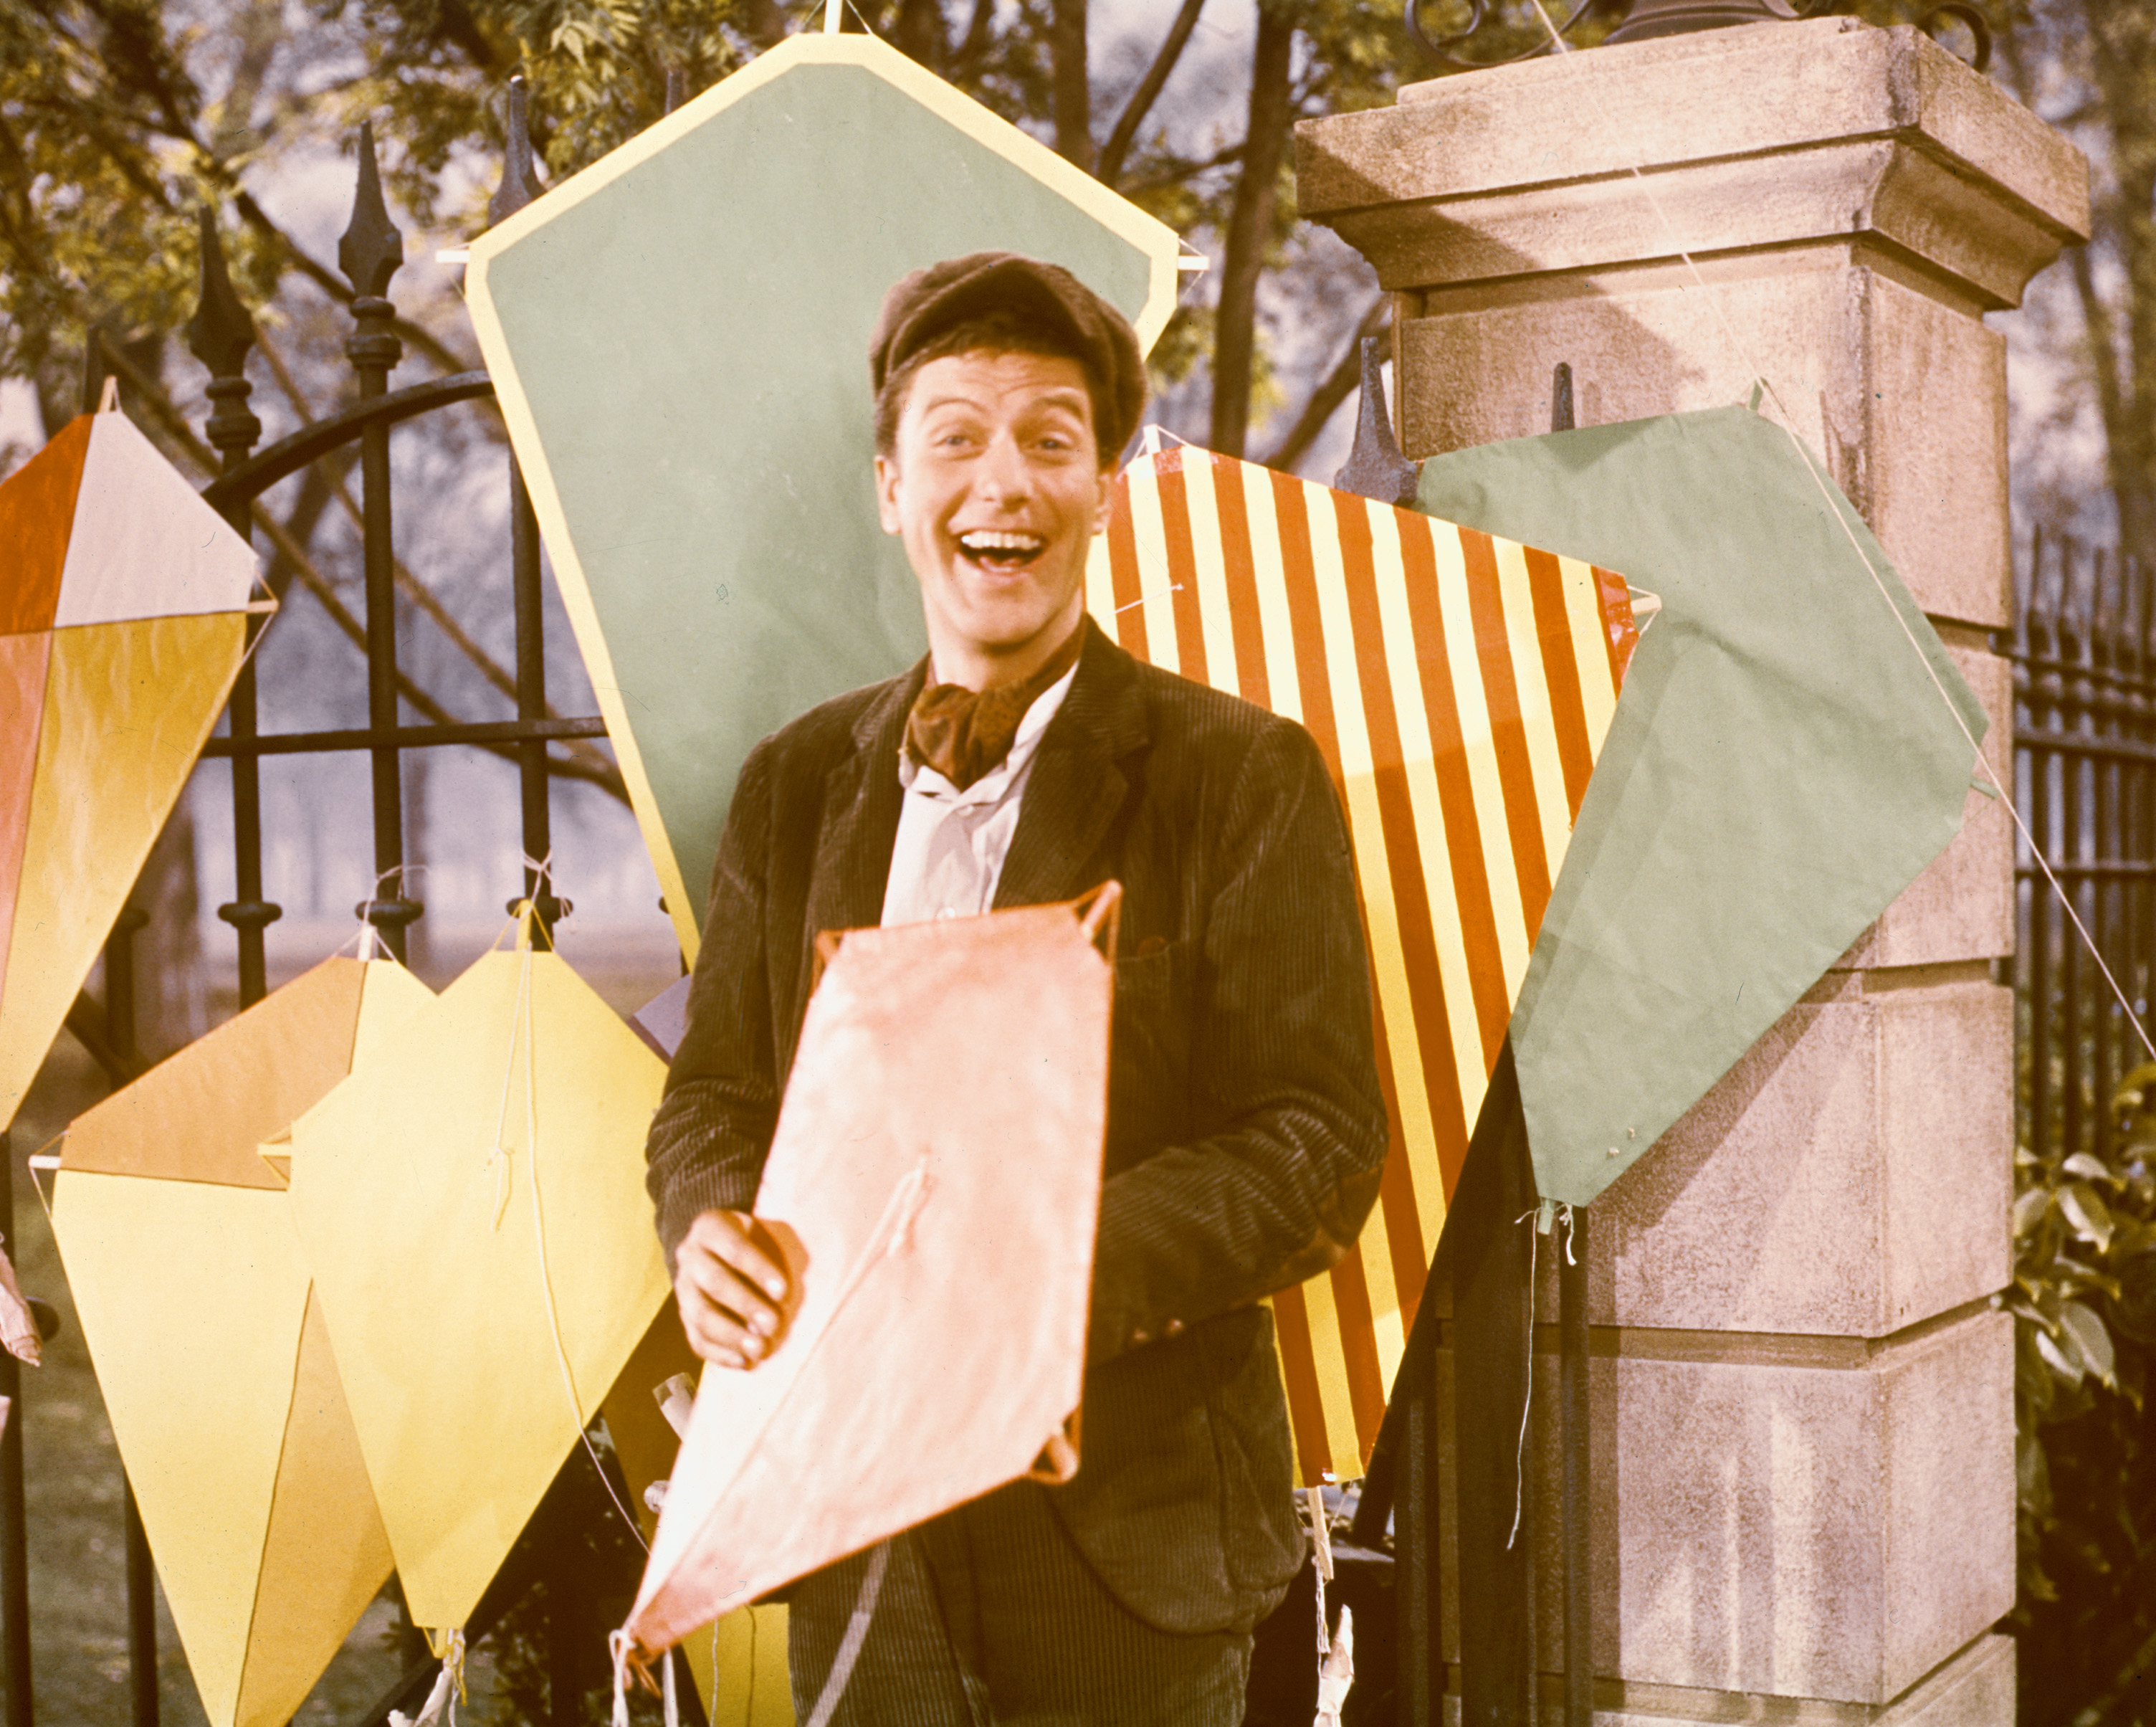 Dick Van Dyke Original 'Mary Poppins' Getty